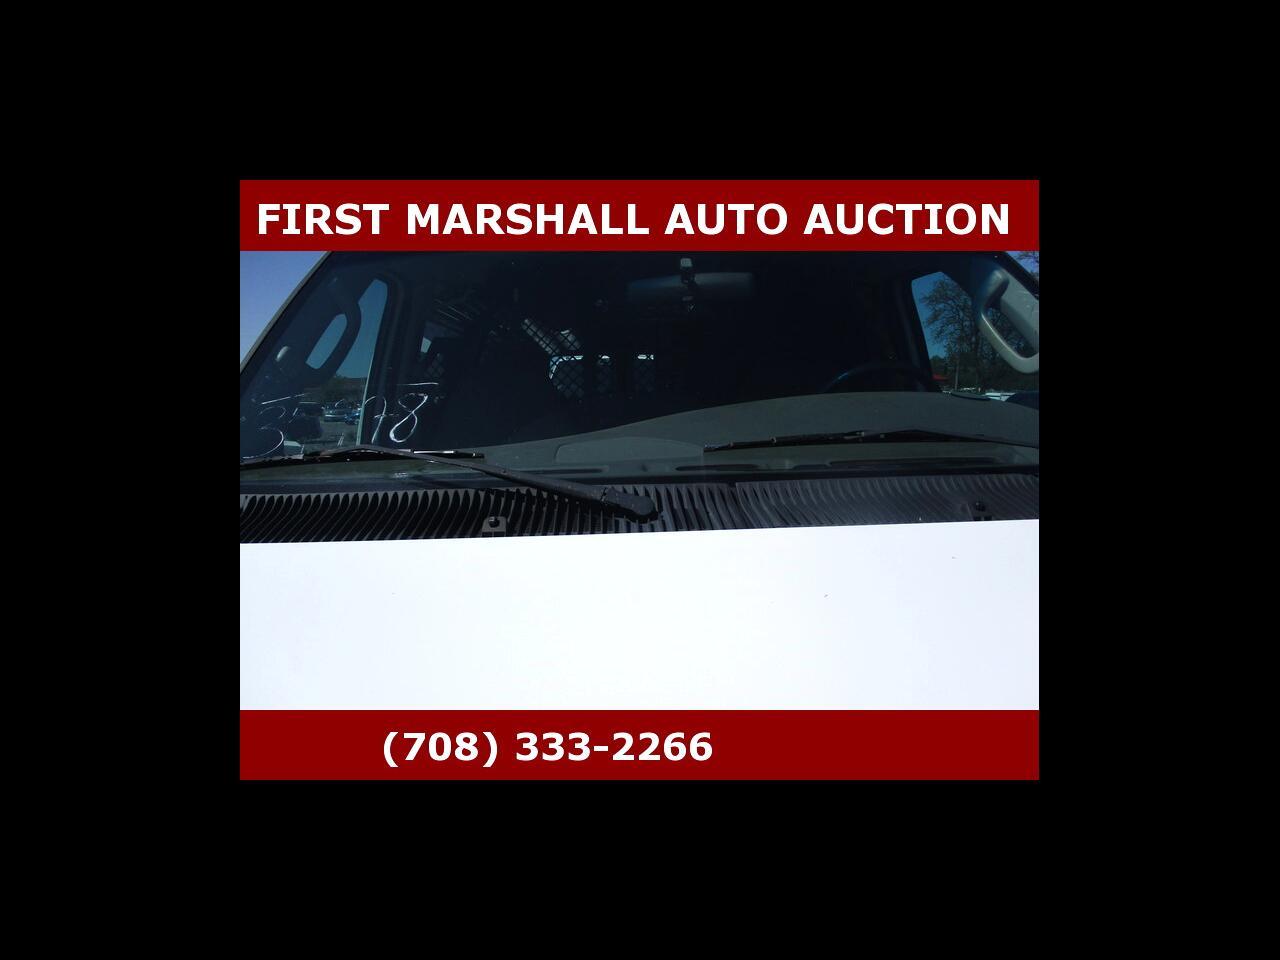 Used Vans Under $1,000: 84 Vehicles from $500 - iSeeCars com